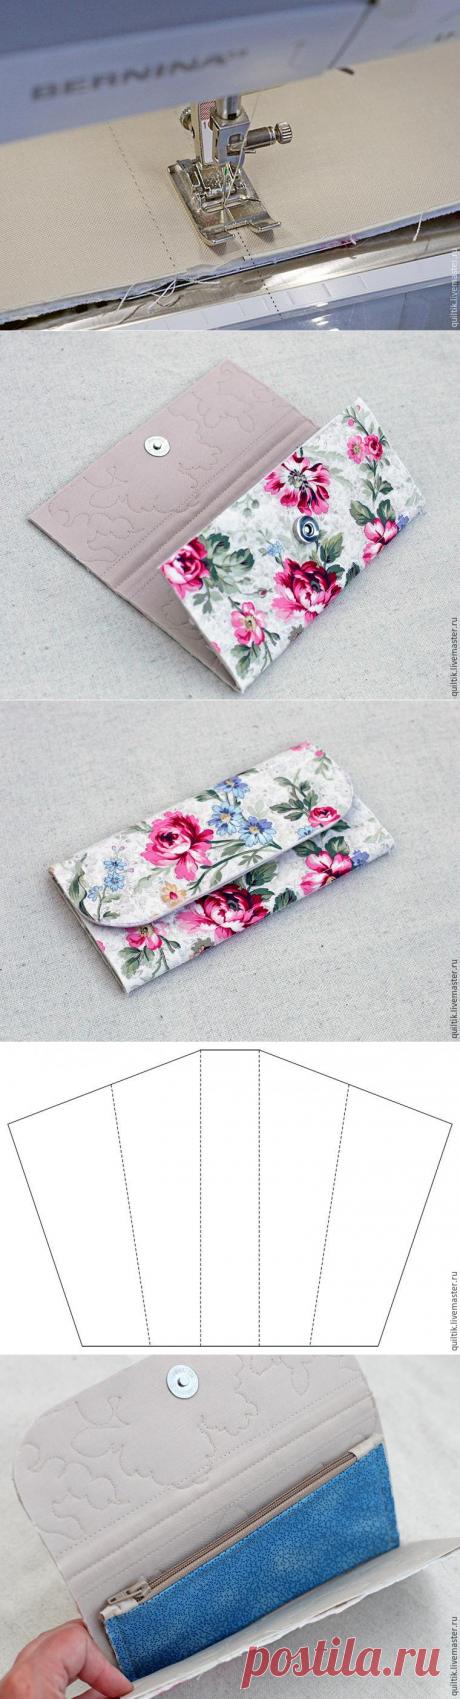 Мастер-класс: шьем текстильный кошелек – Ярмарка Мастеров